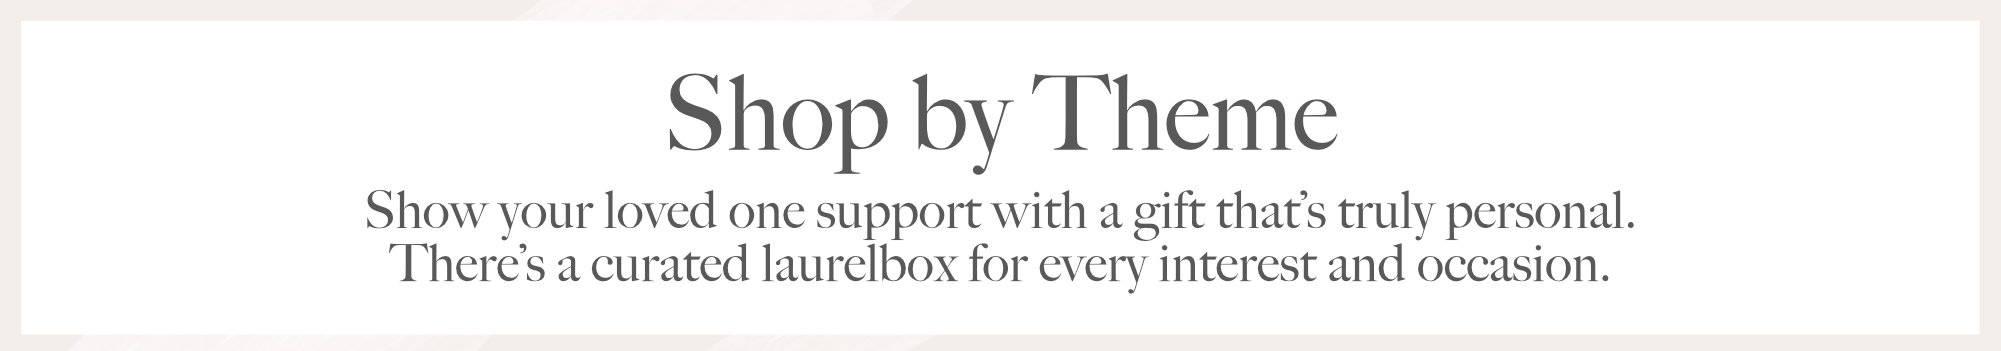 https://www.laurelbox.com/collections/prepared-laurelboxes